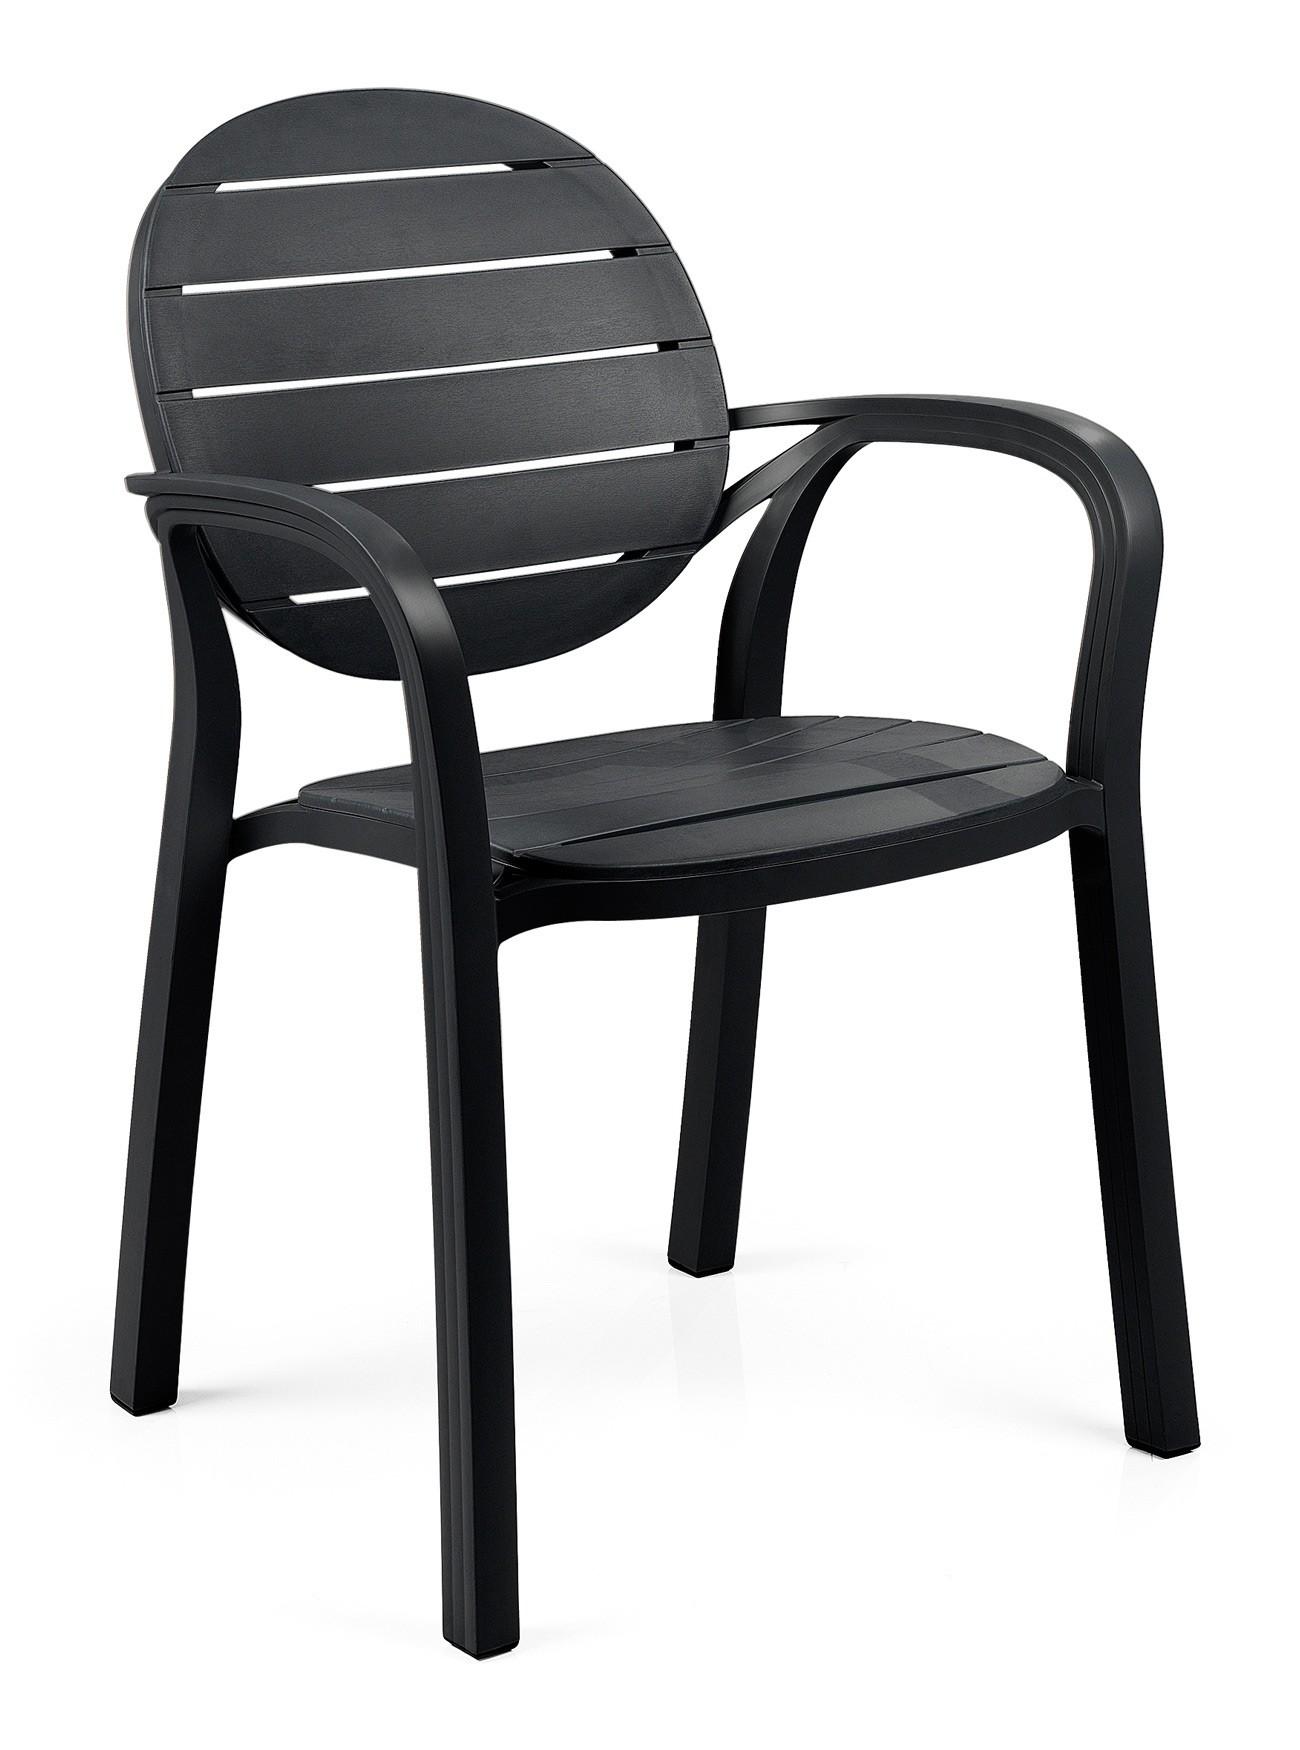 stapelstuhl gartenstuhl palma kunststoff stapelbar. Black Bedroom Furniture Sets. Home Design Ideas